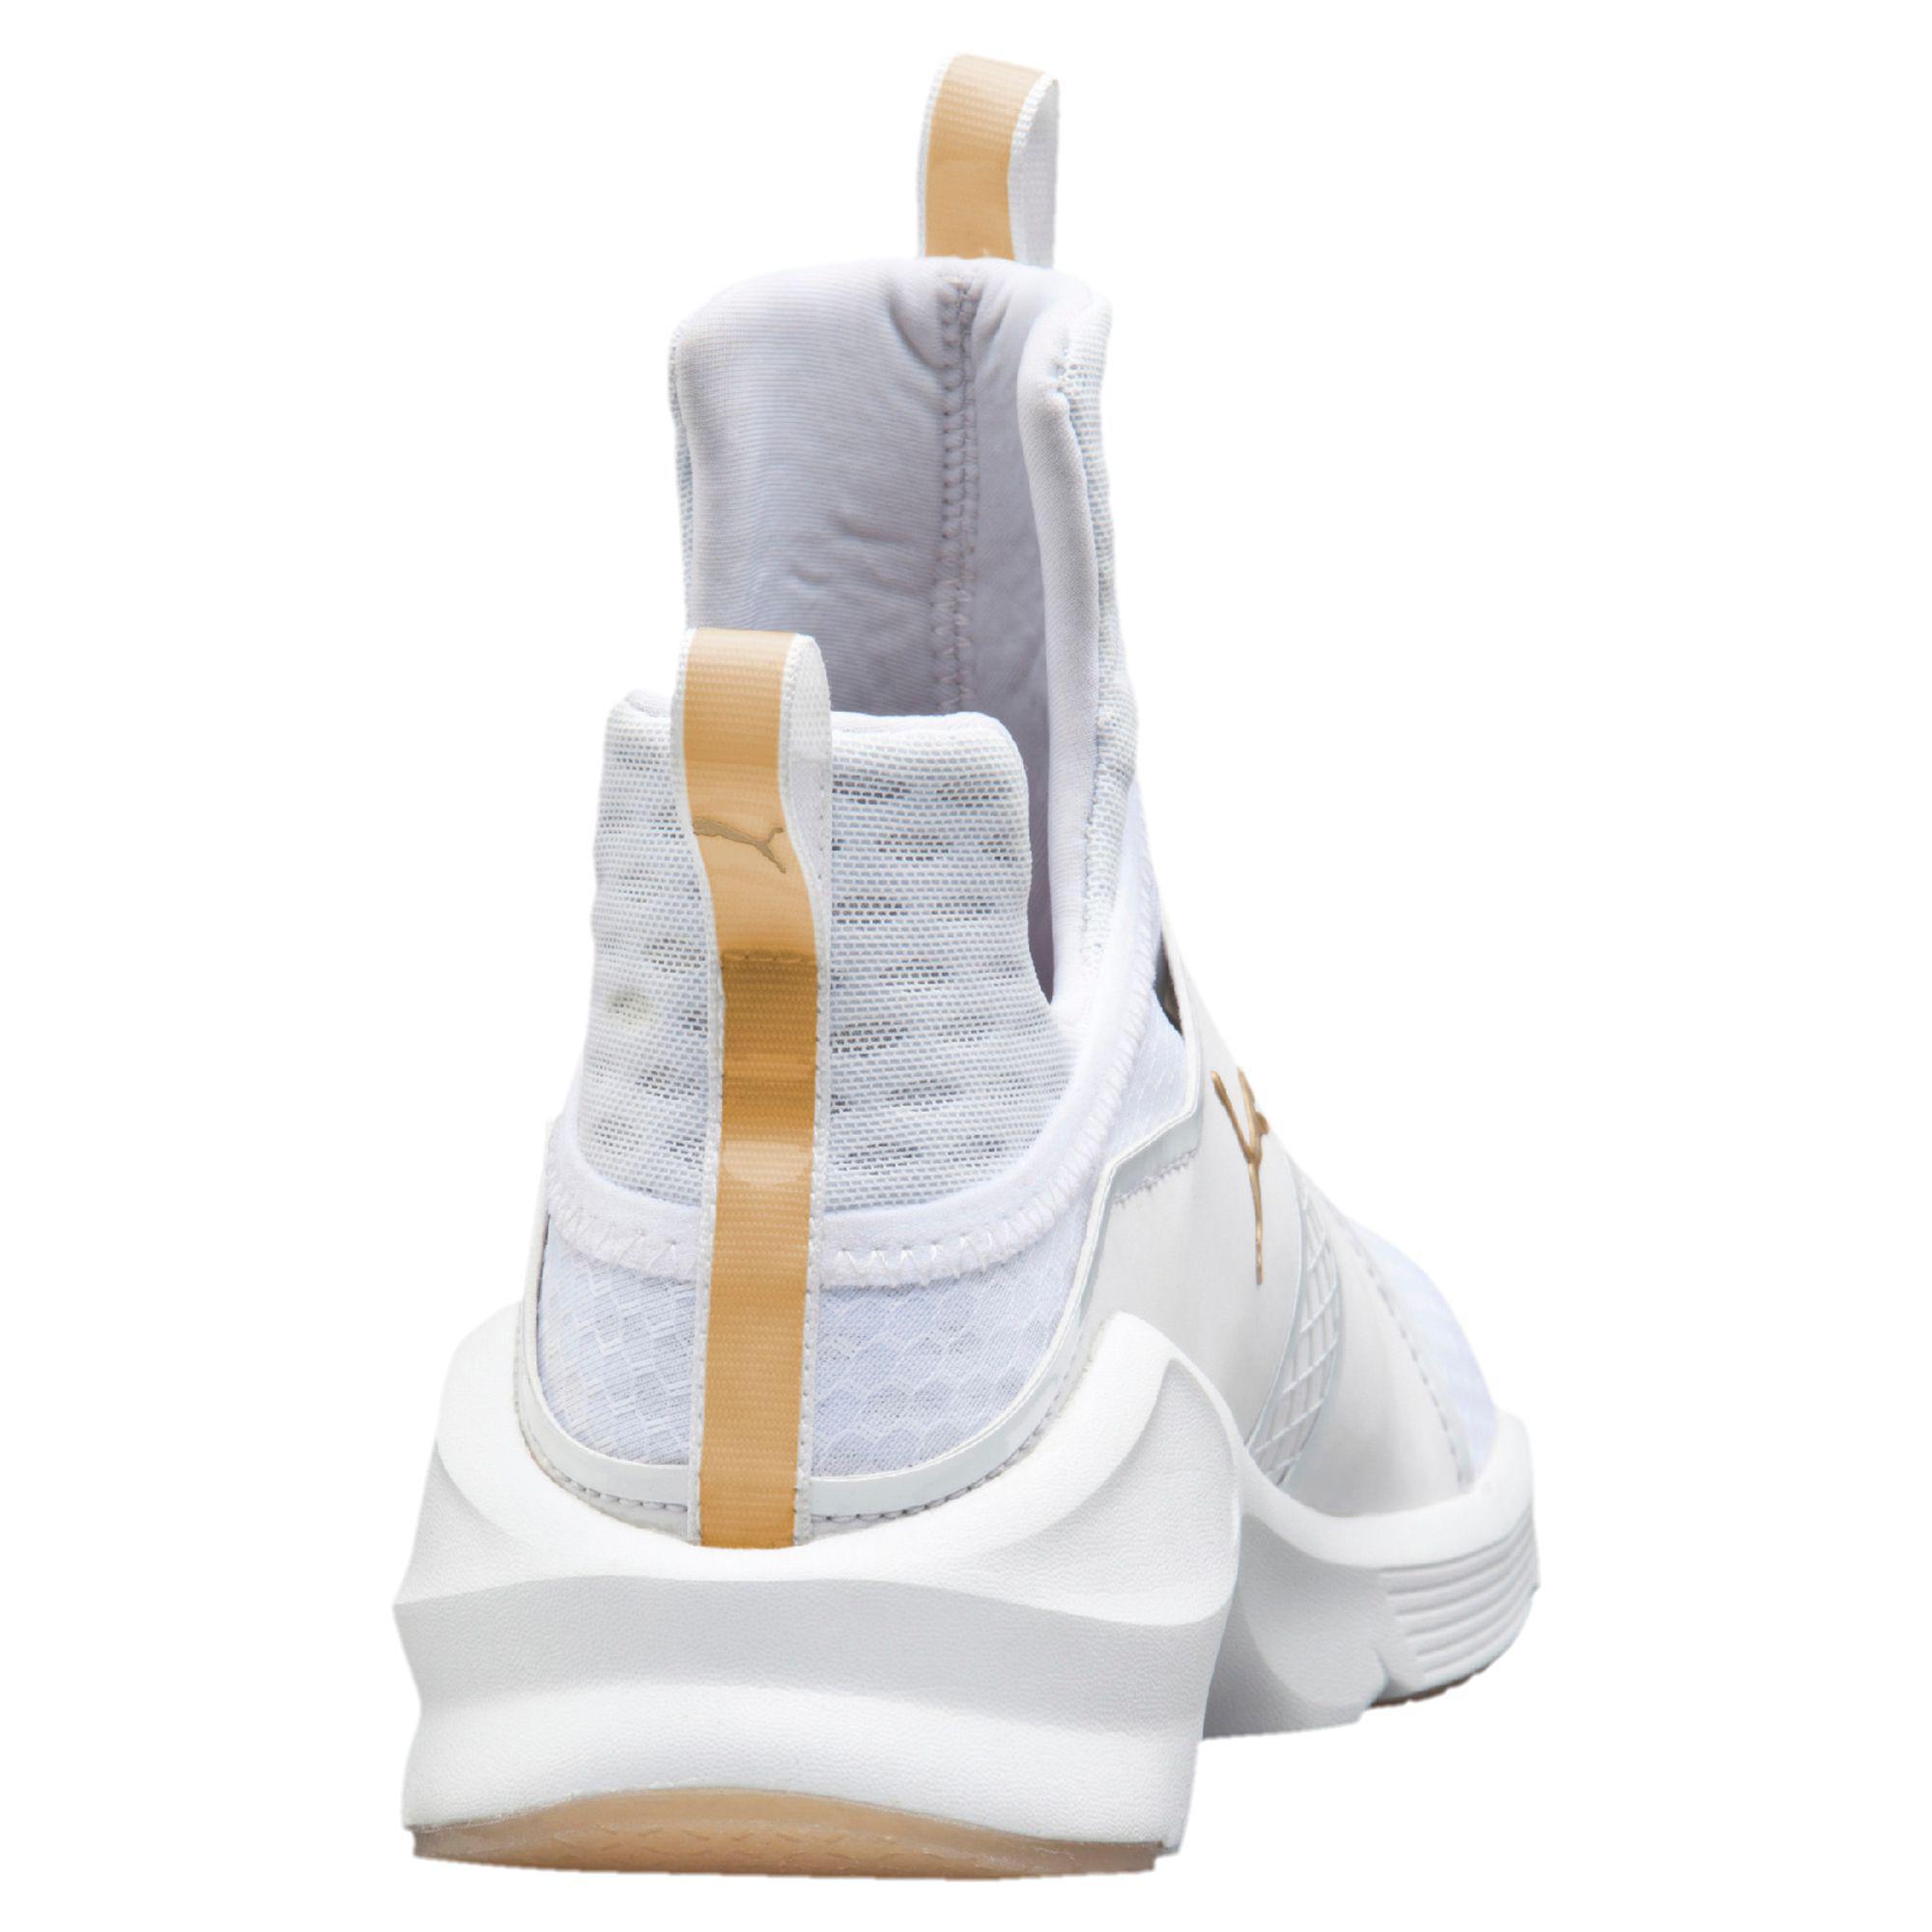 Lyst - PUMA Fierce Gold Women s Training Shoes 7aec89389